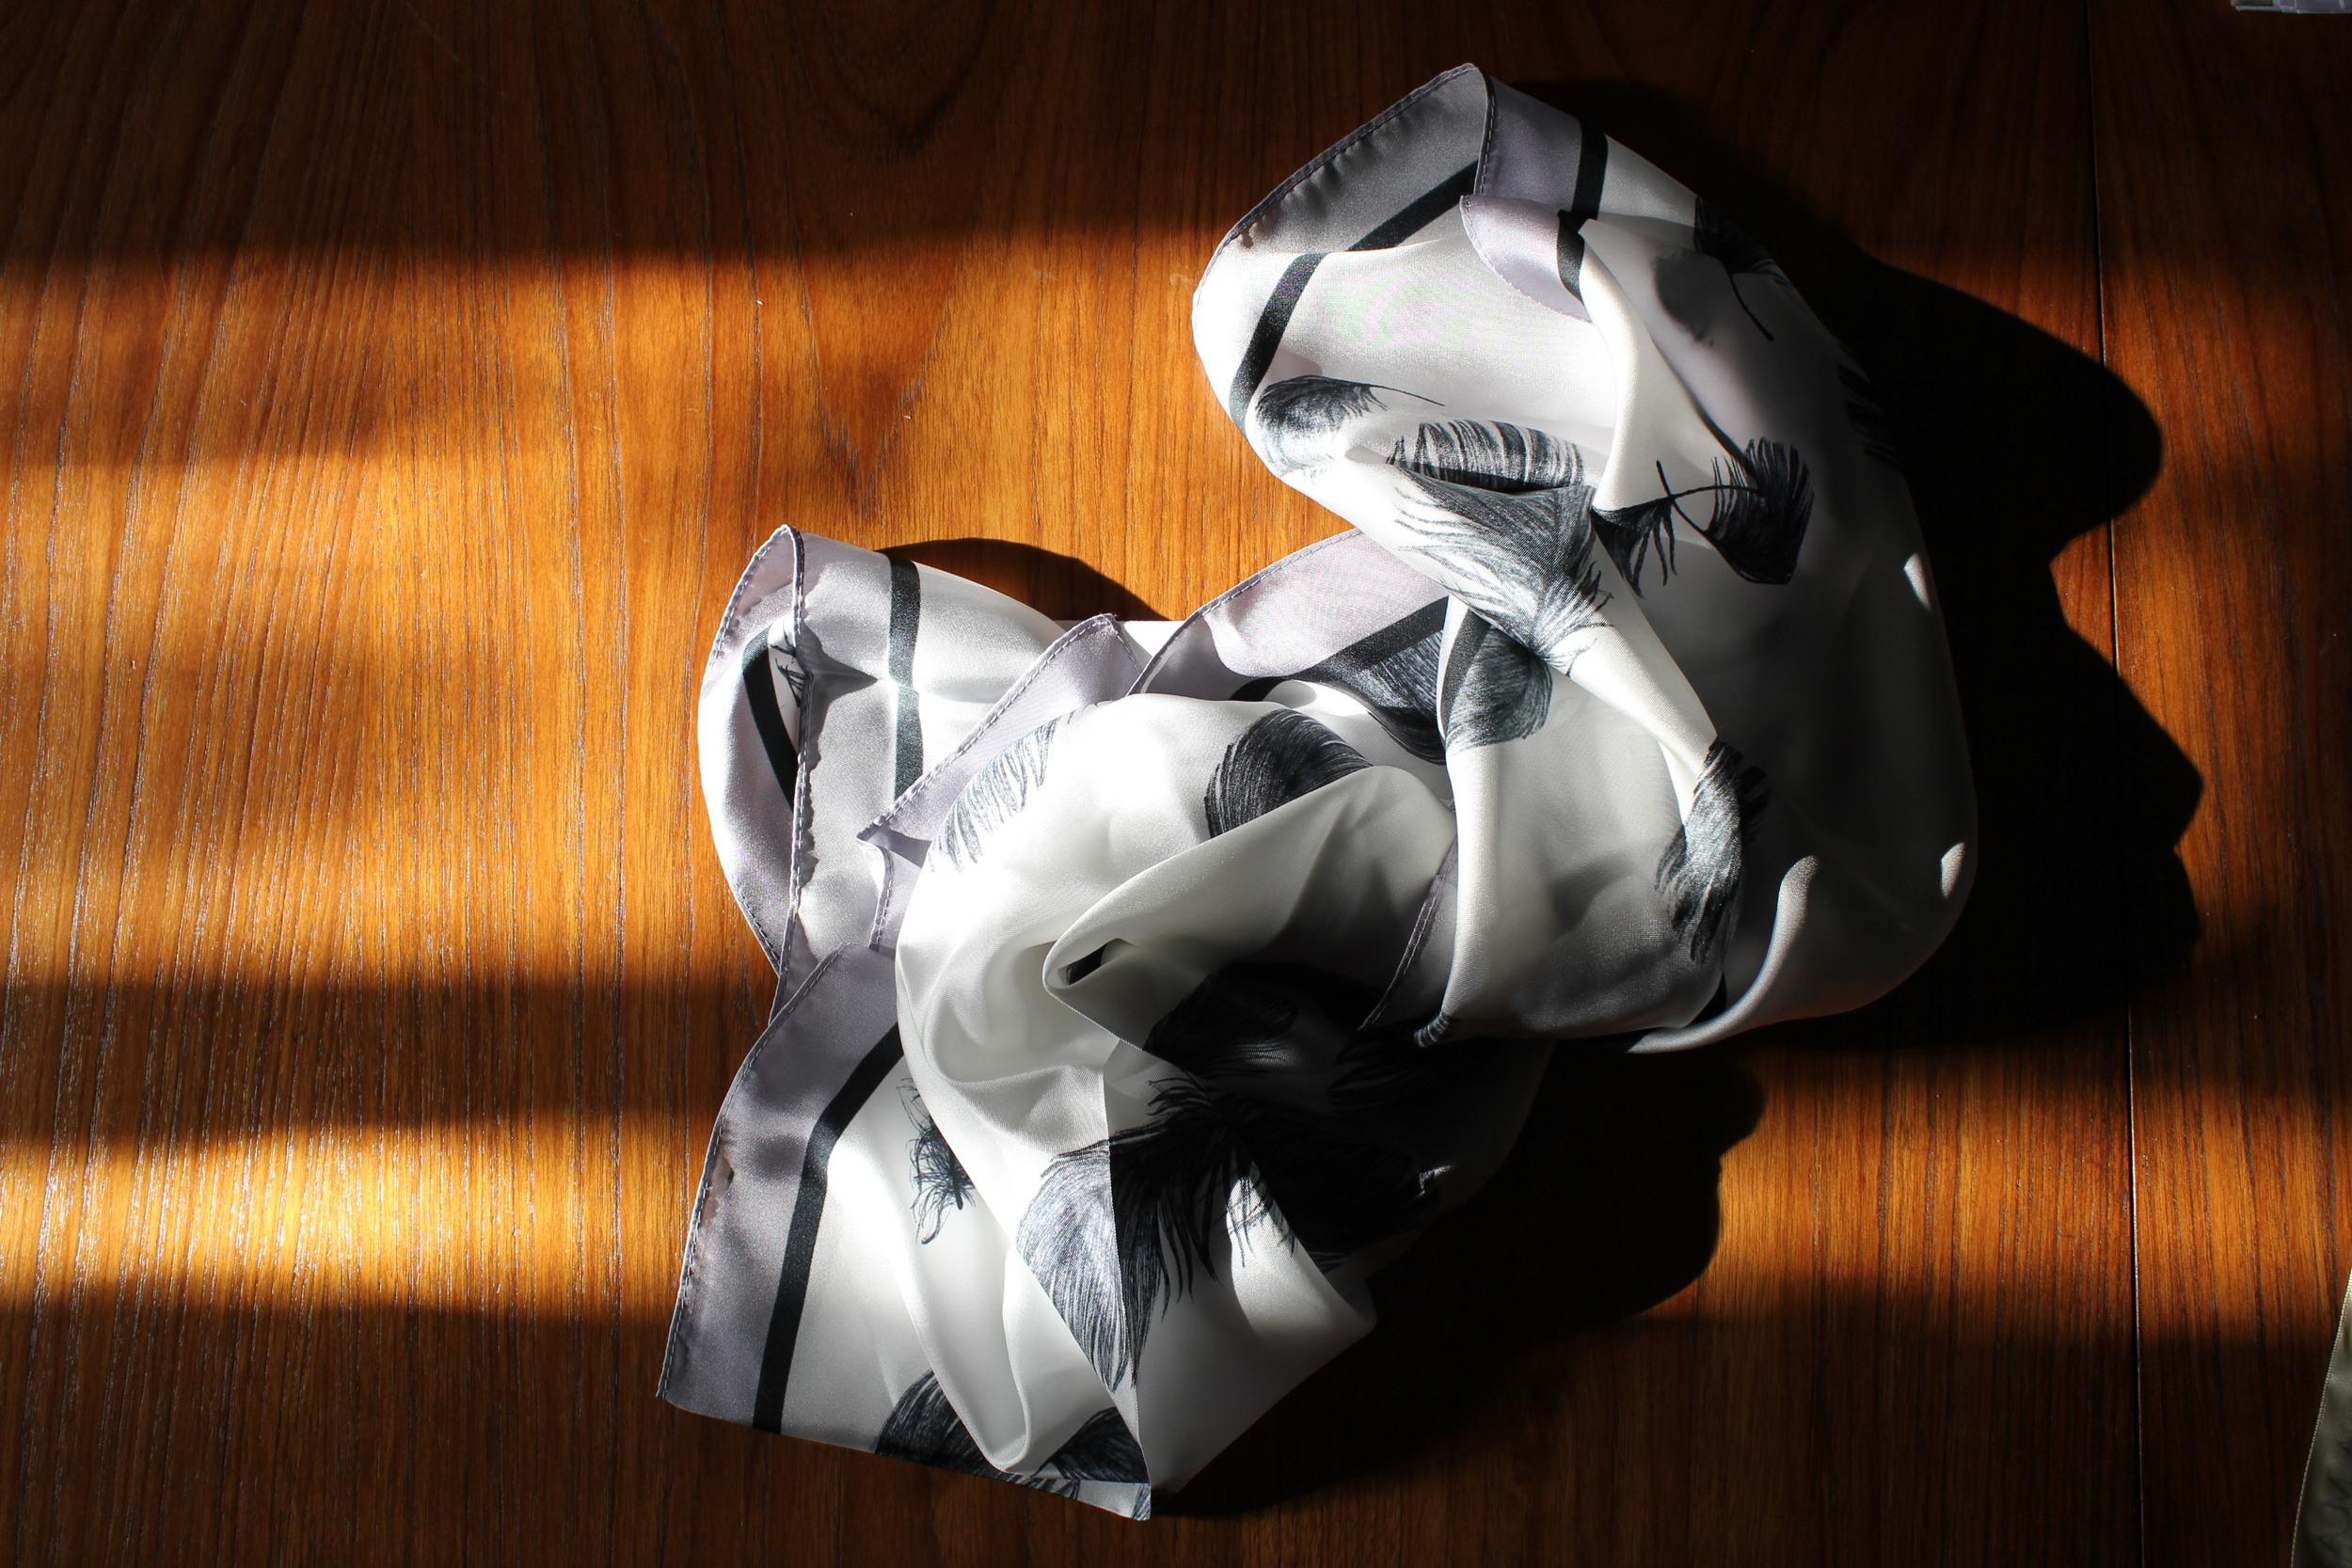 reiss silk scarf amara blog awards